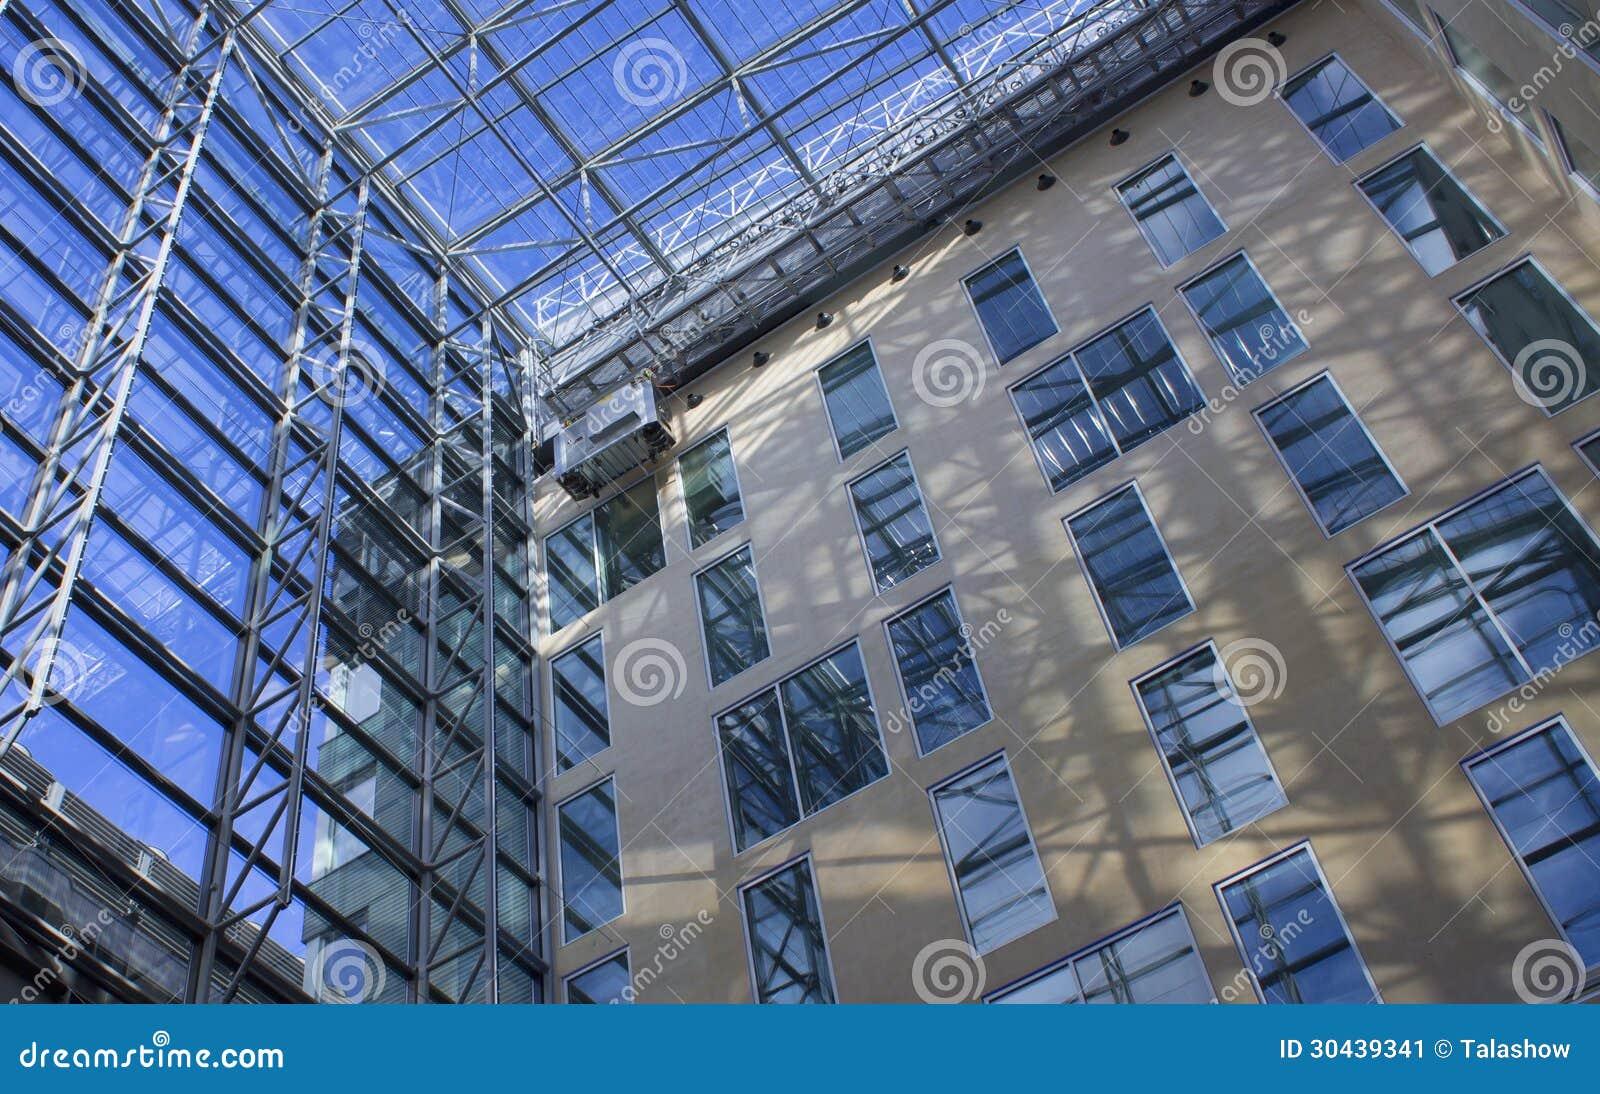 Corporate Business Building Corporate business building